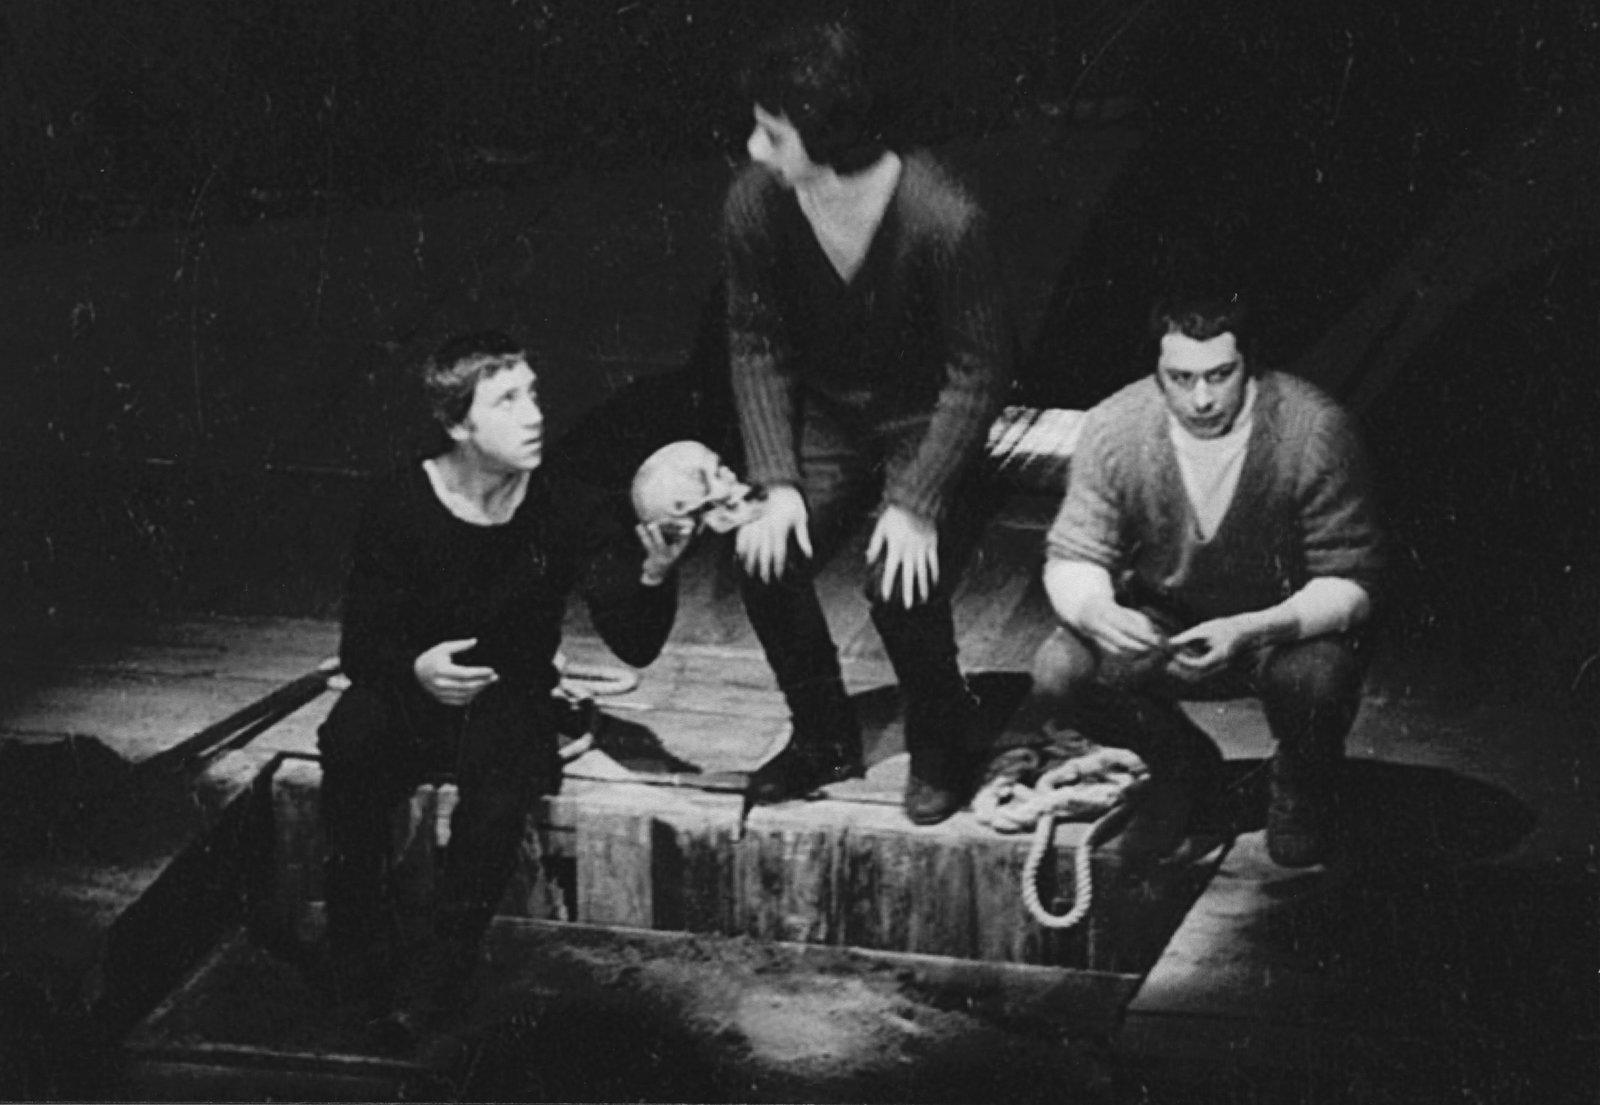 Фото: Пресс-служба Театра на Таганке